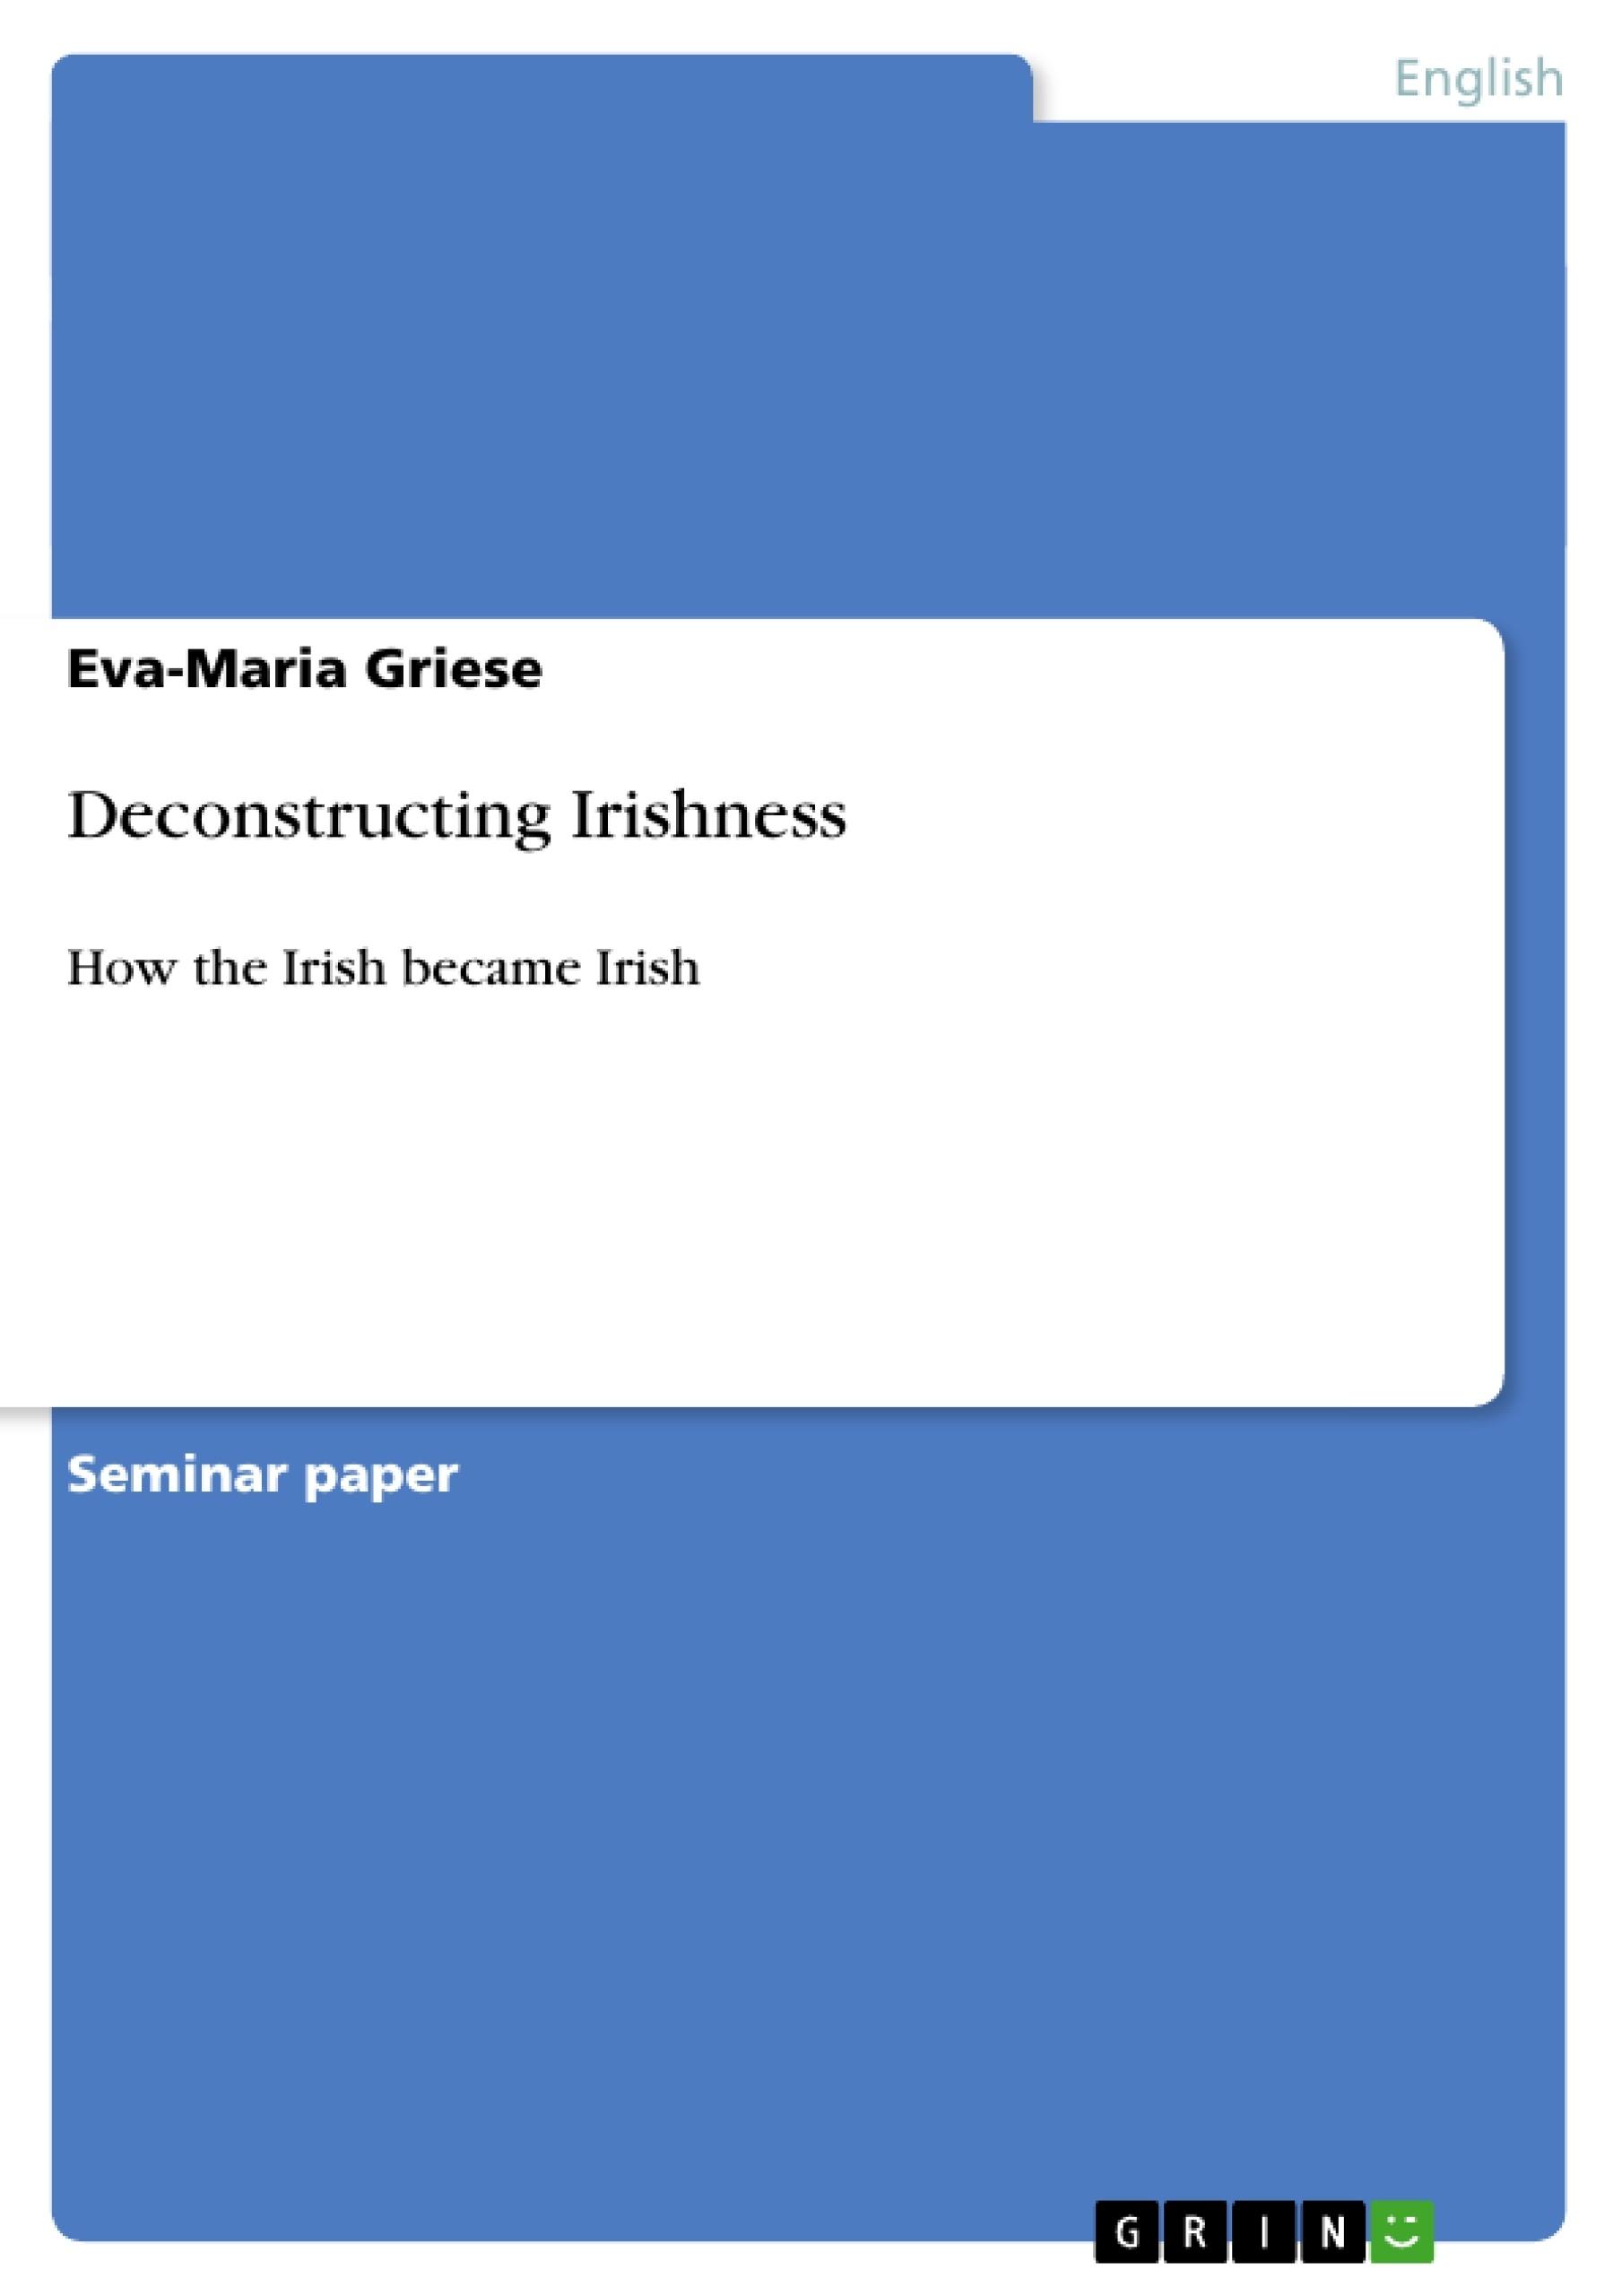 Title: Deconstructing Irishness